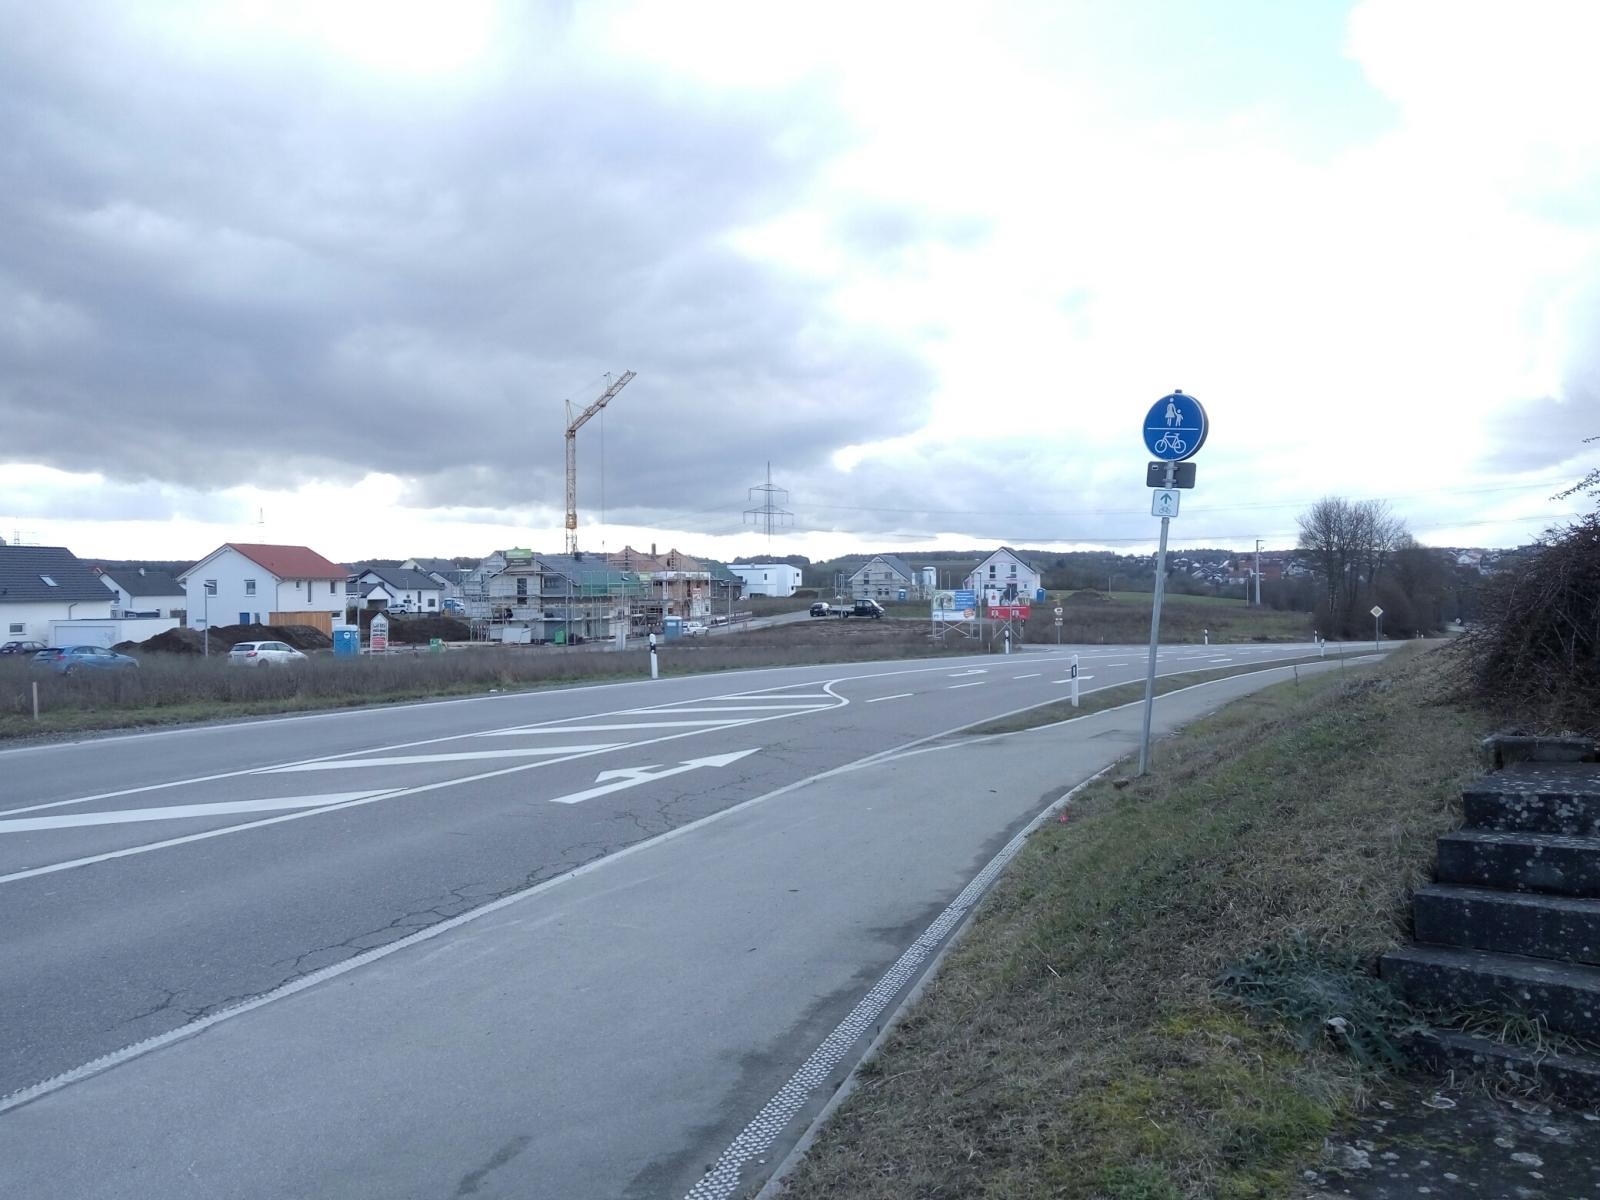 Baugebiet Bibis 4. Bauabschnitt Gemeinde Hirrlingen_1